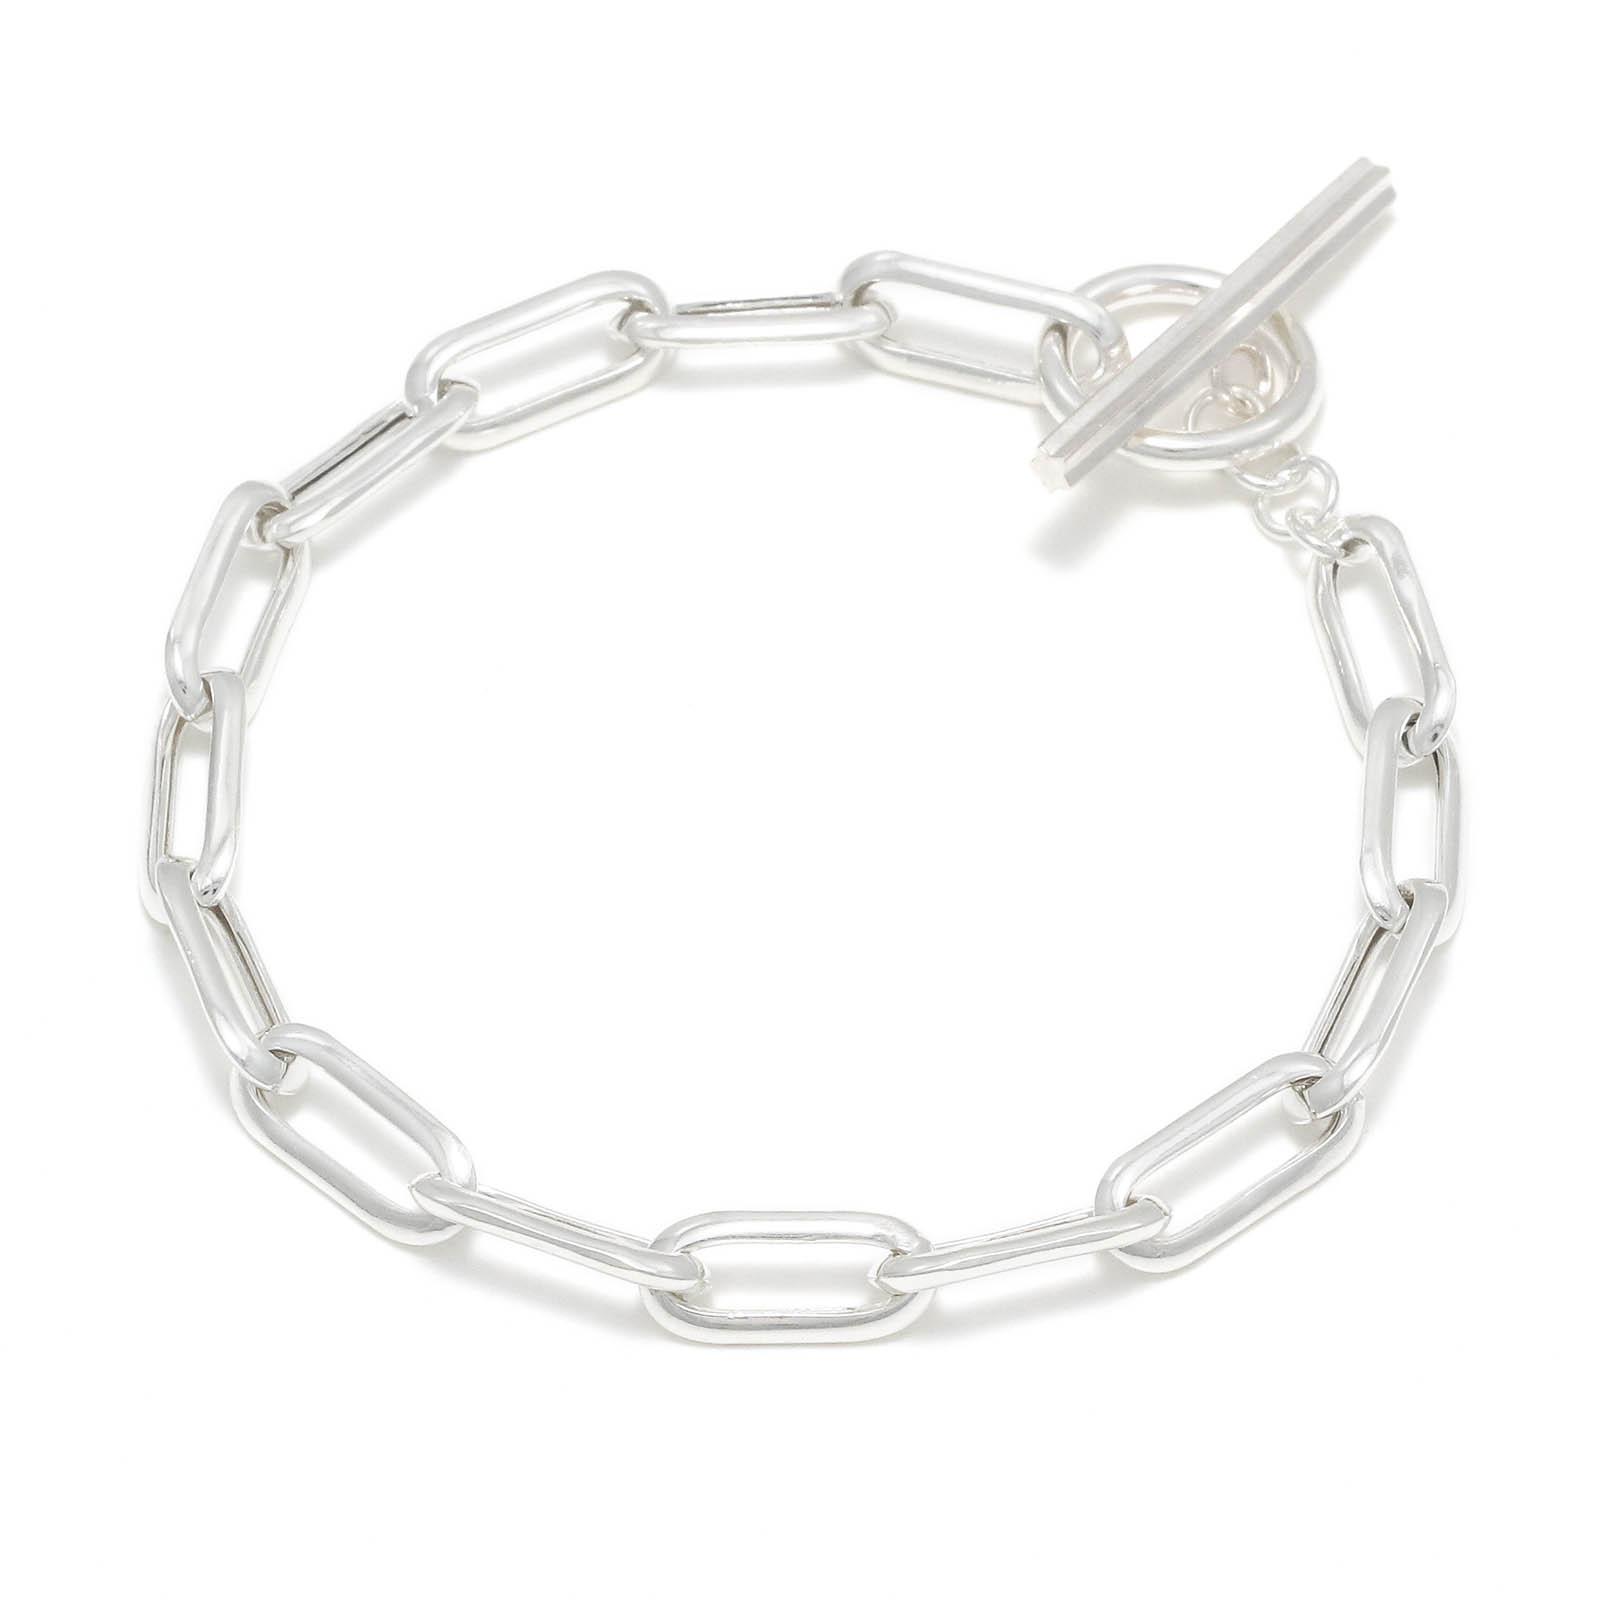 Hollow Chain Bracelet TYPE:1 - Silver